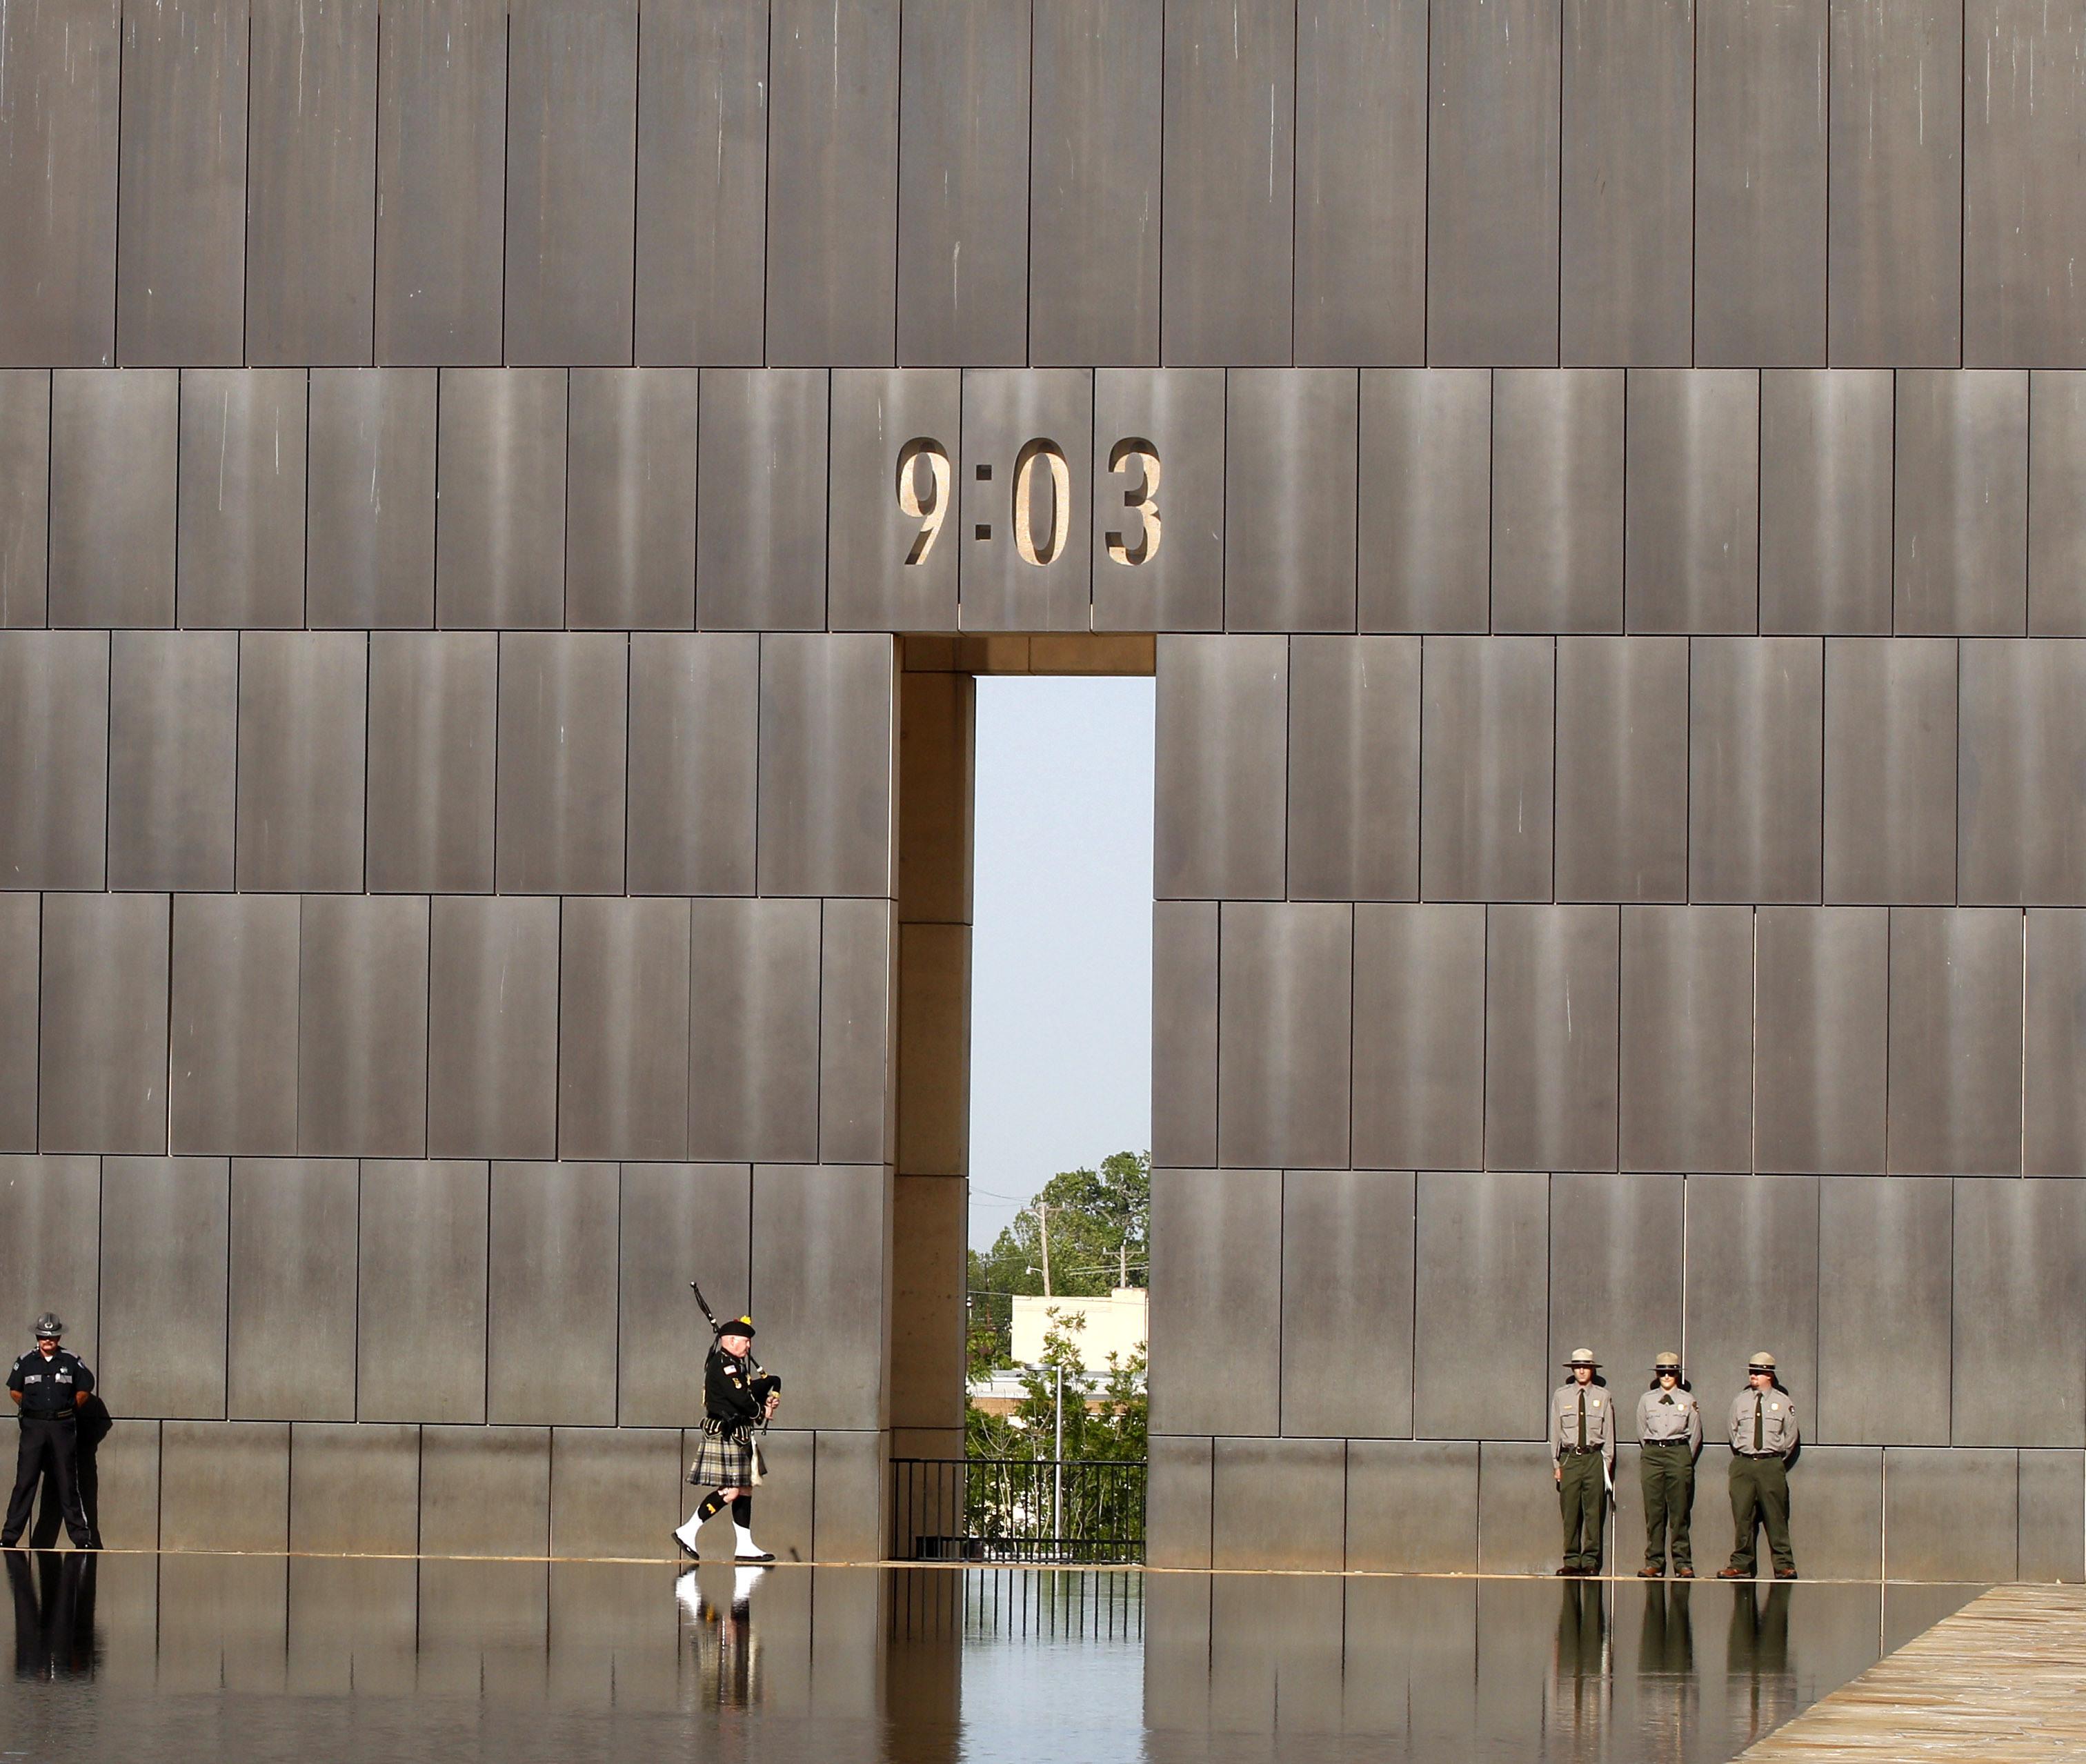 Alfred P. Murrah大樓改建為爆炸案的紀念場所Oklahoma City National Memorial and Museum。(美聯社)